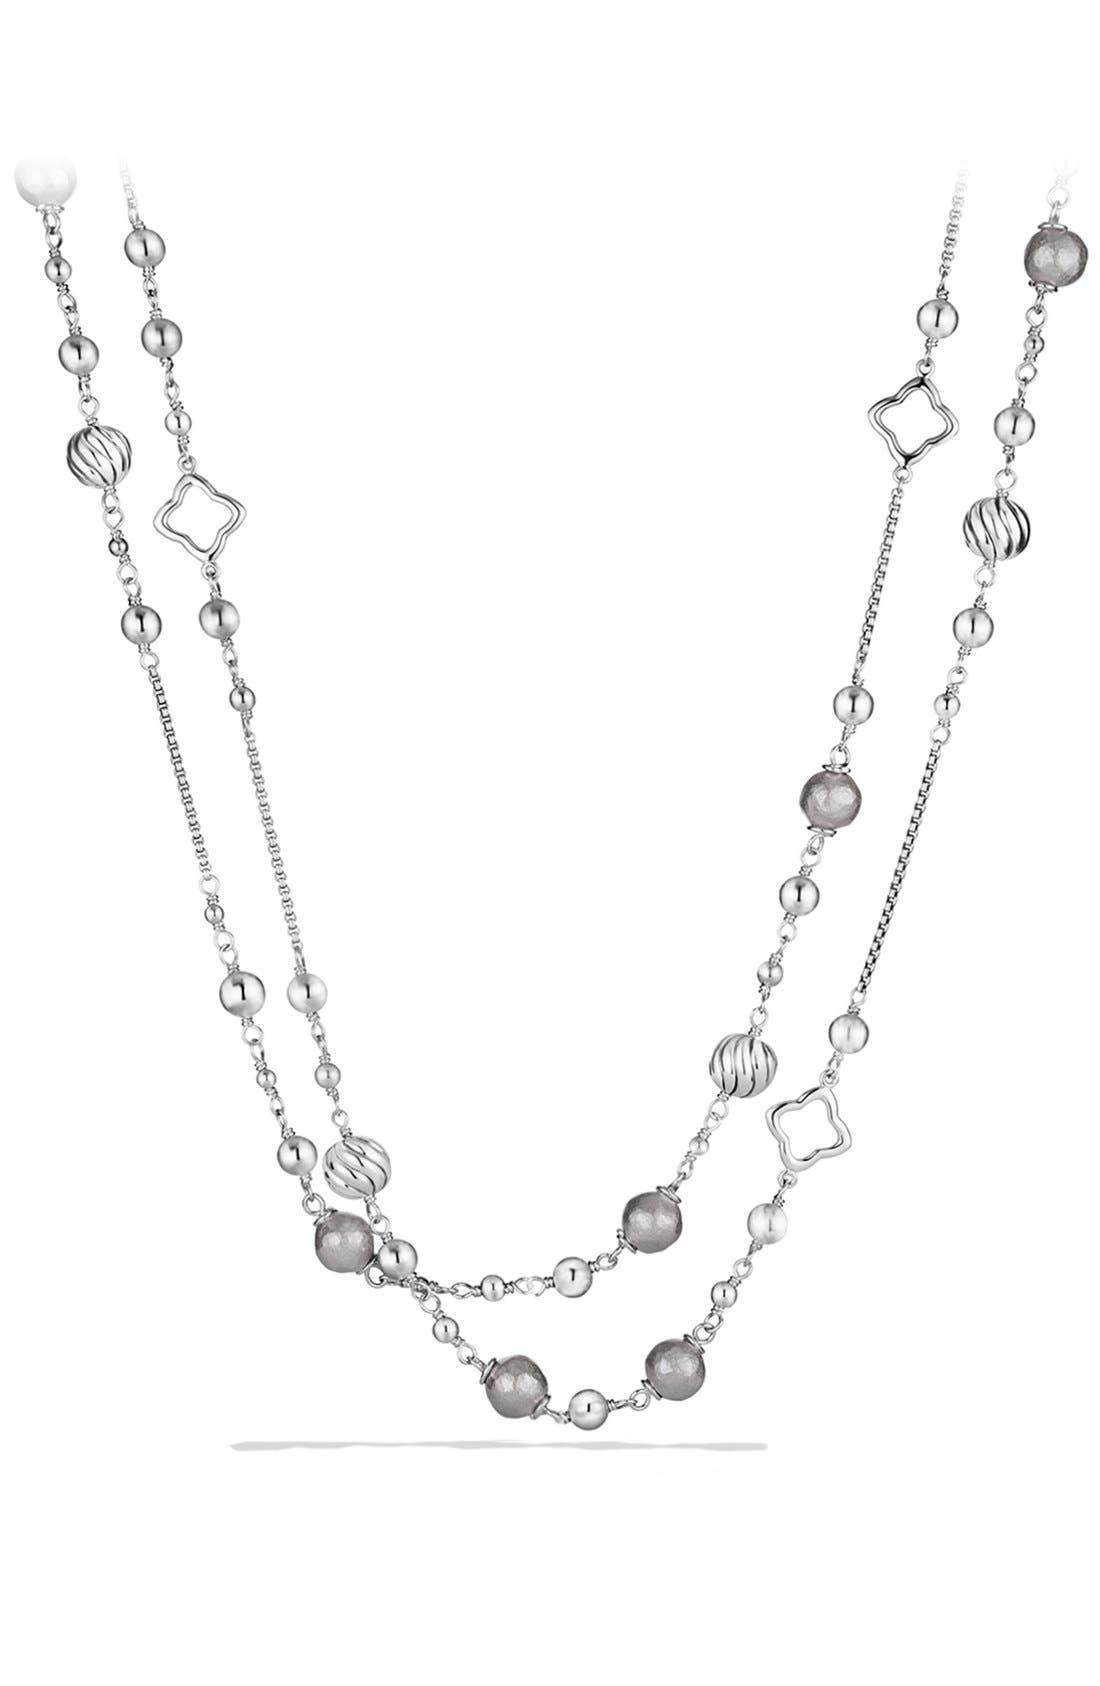 David Yurman 'DY Elements' Chain Necklace